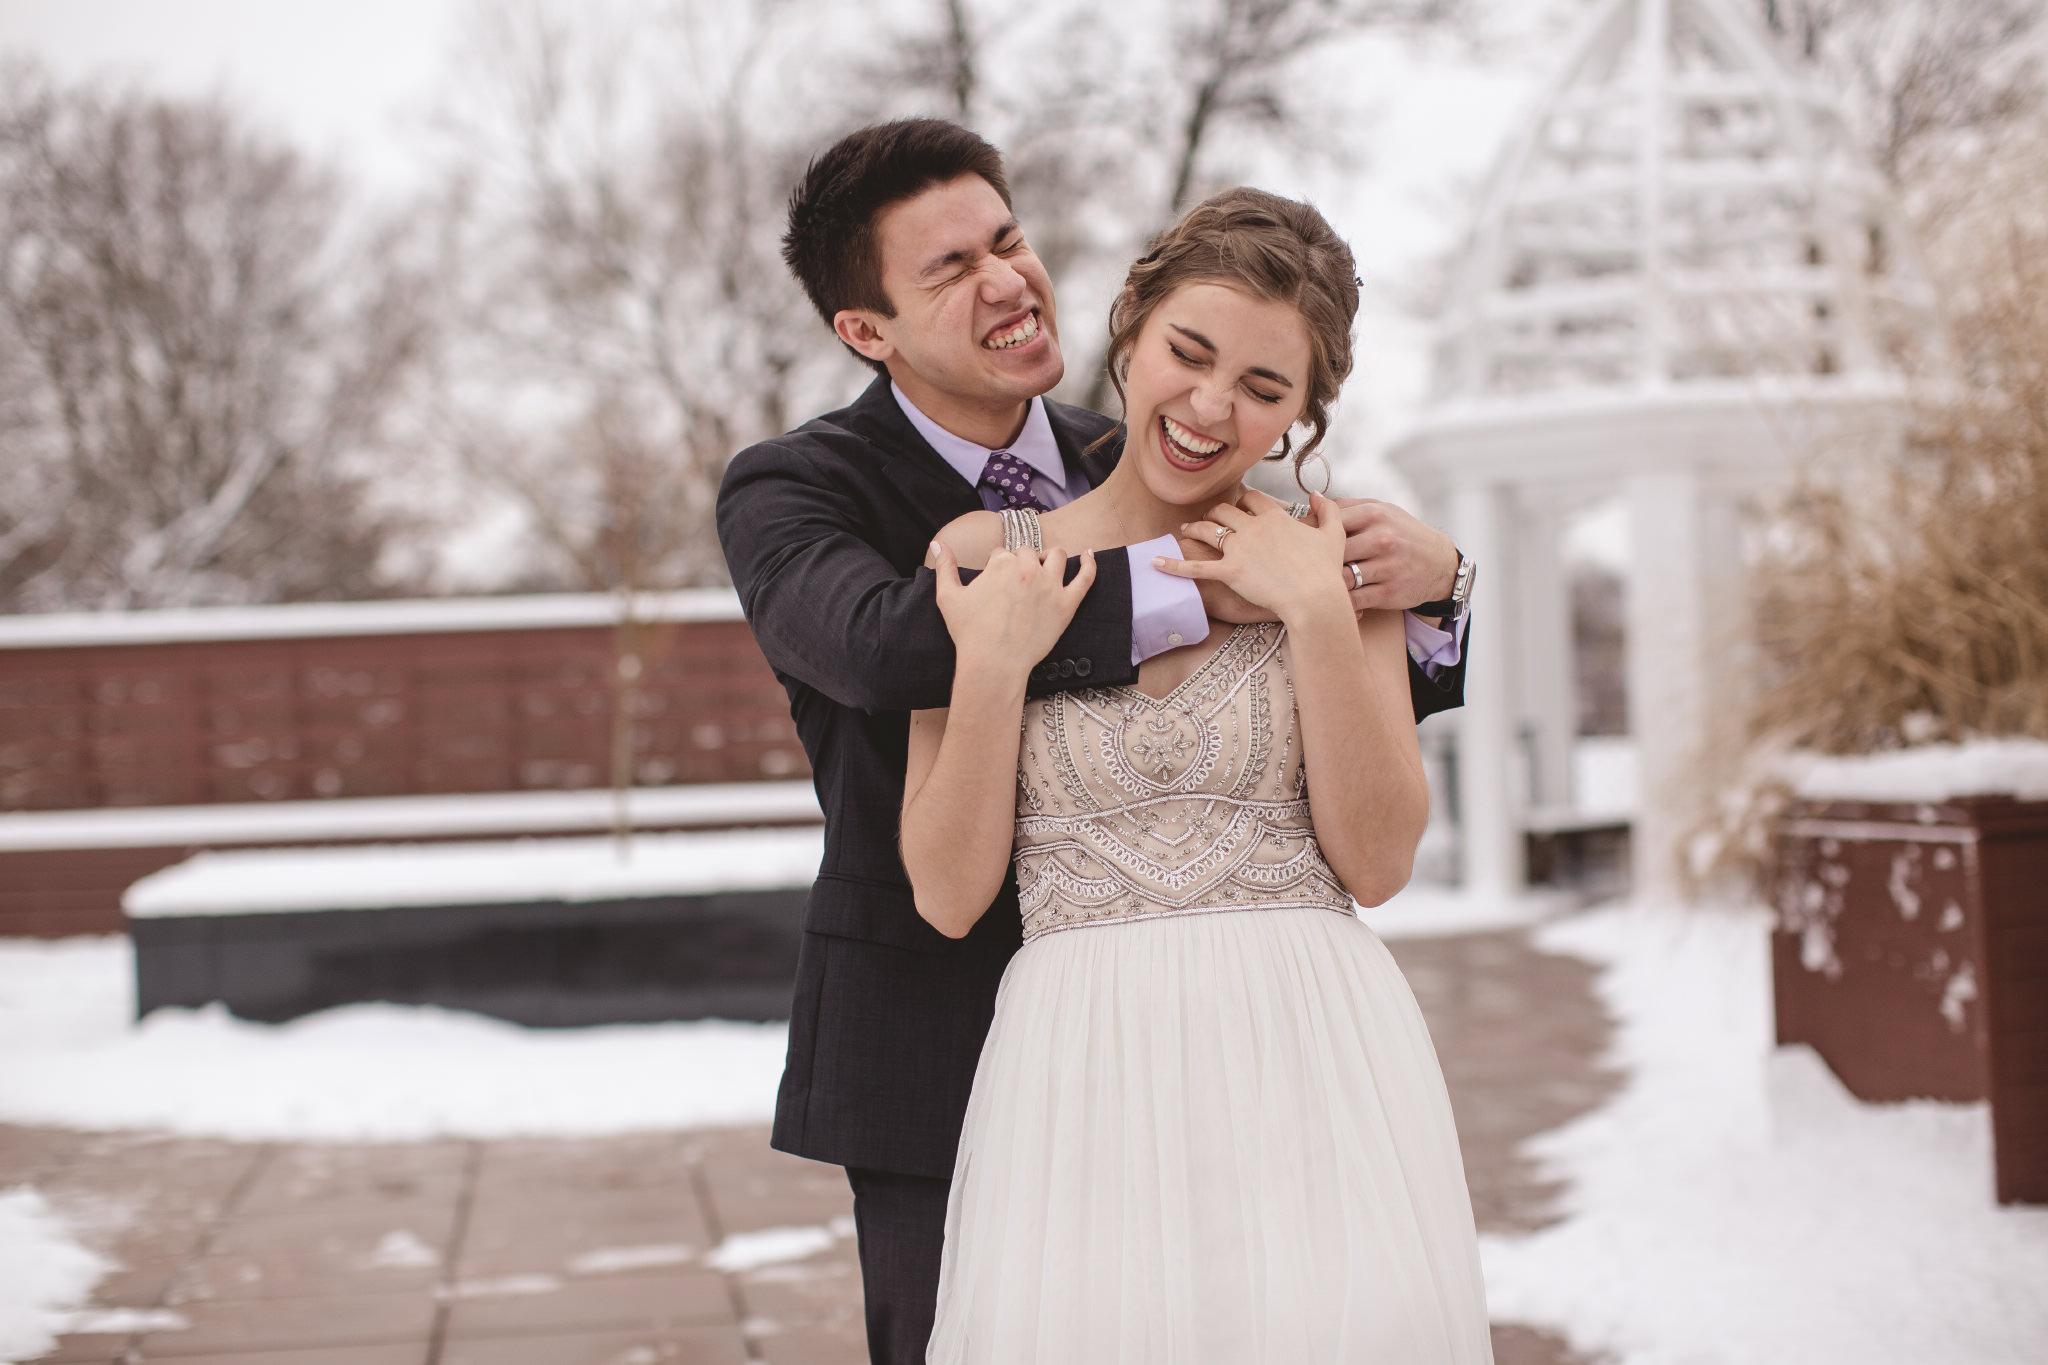 wedding photographer near me dayton ohio